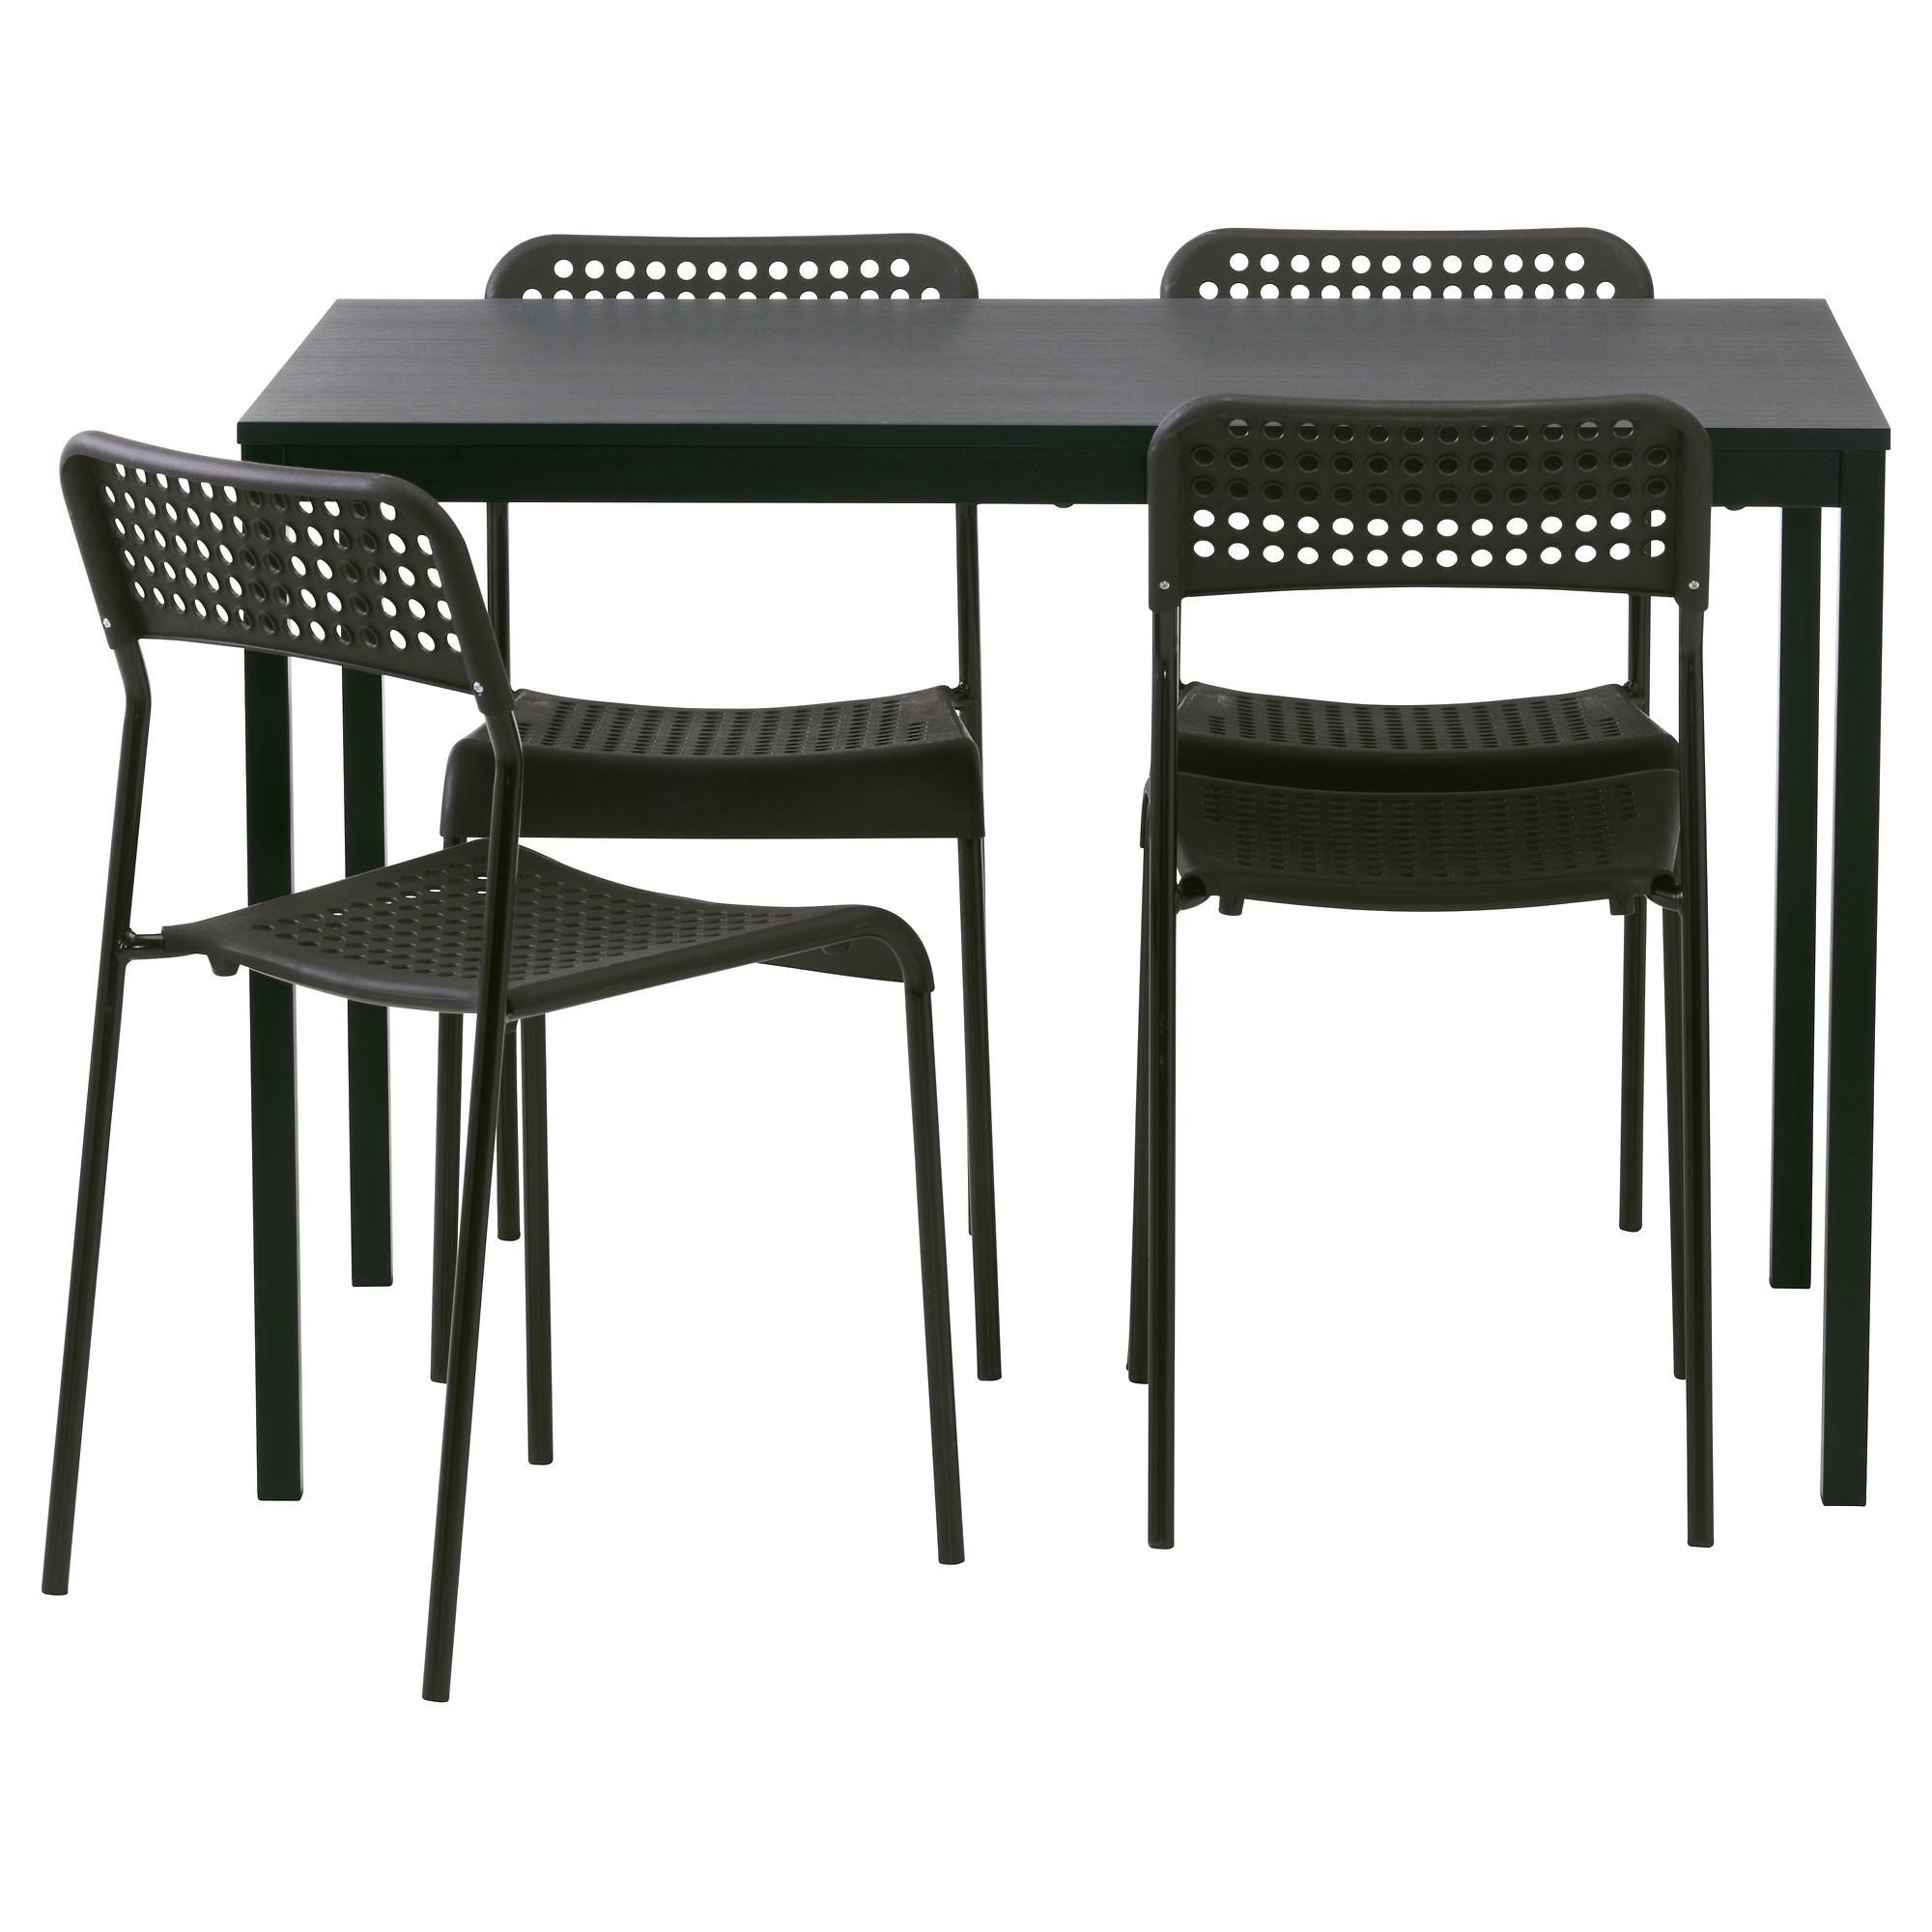 TÄRENDÖ/ADDE table and 4 chairs  sc 1 st  Ikea & IKEA Latvia - Shop for Furniture Lighting Home Accessories u0026 More